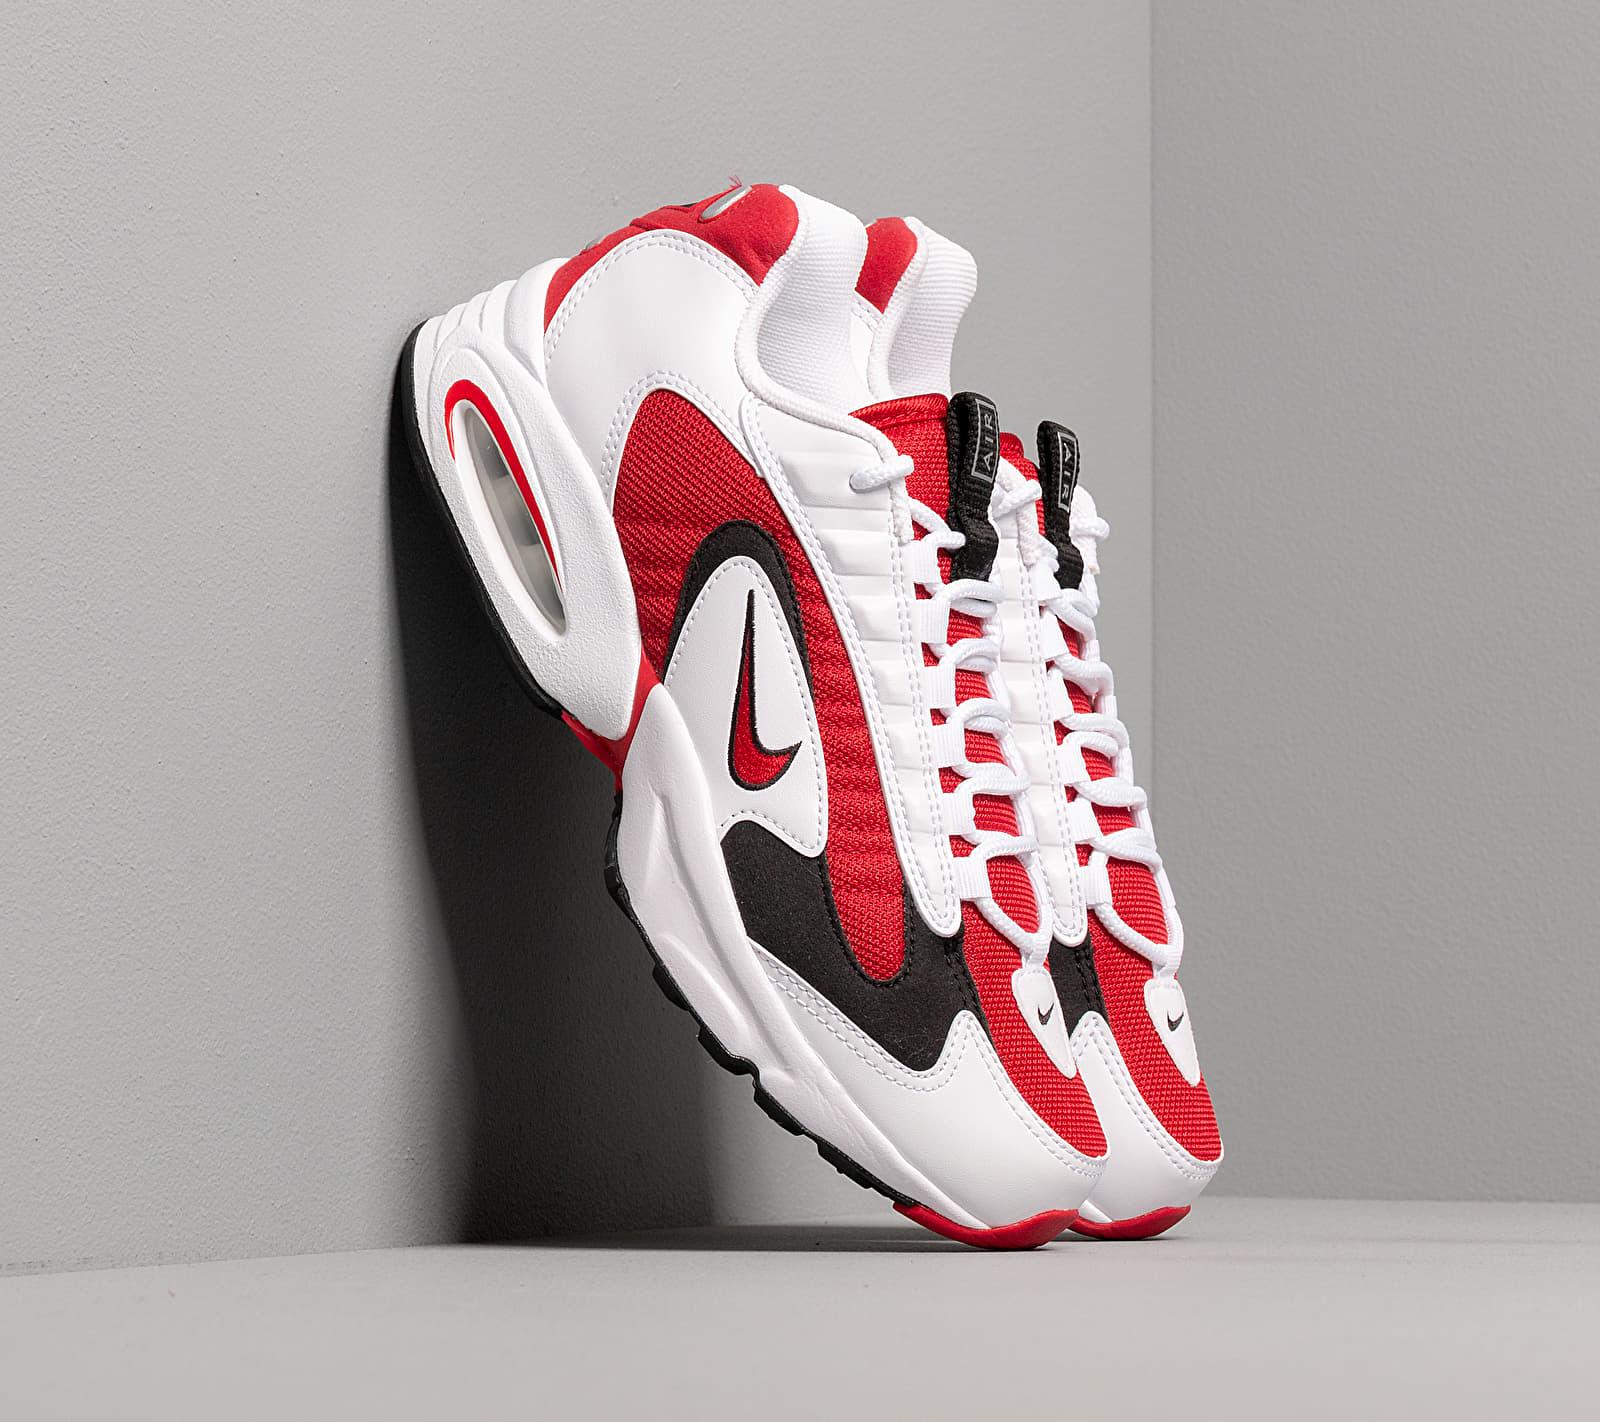 Nike Air Max Triax White/ Gym Red-Black-Soar EUR 42.5